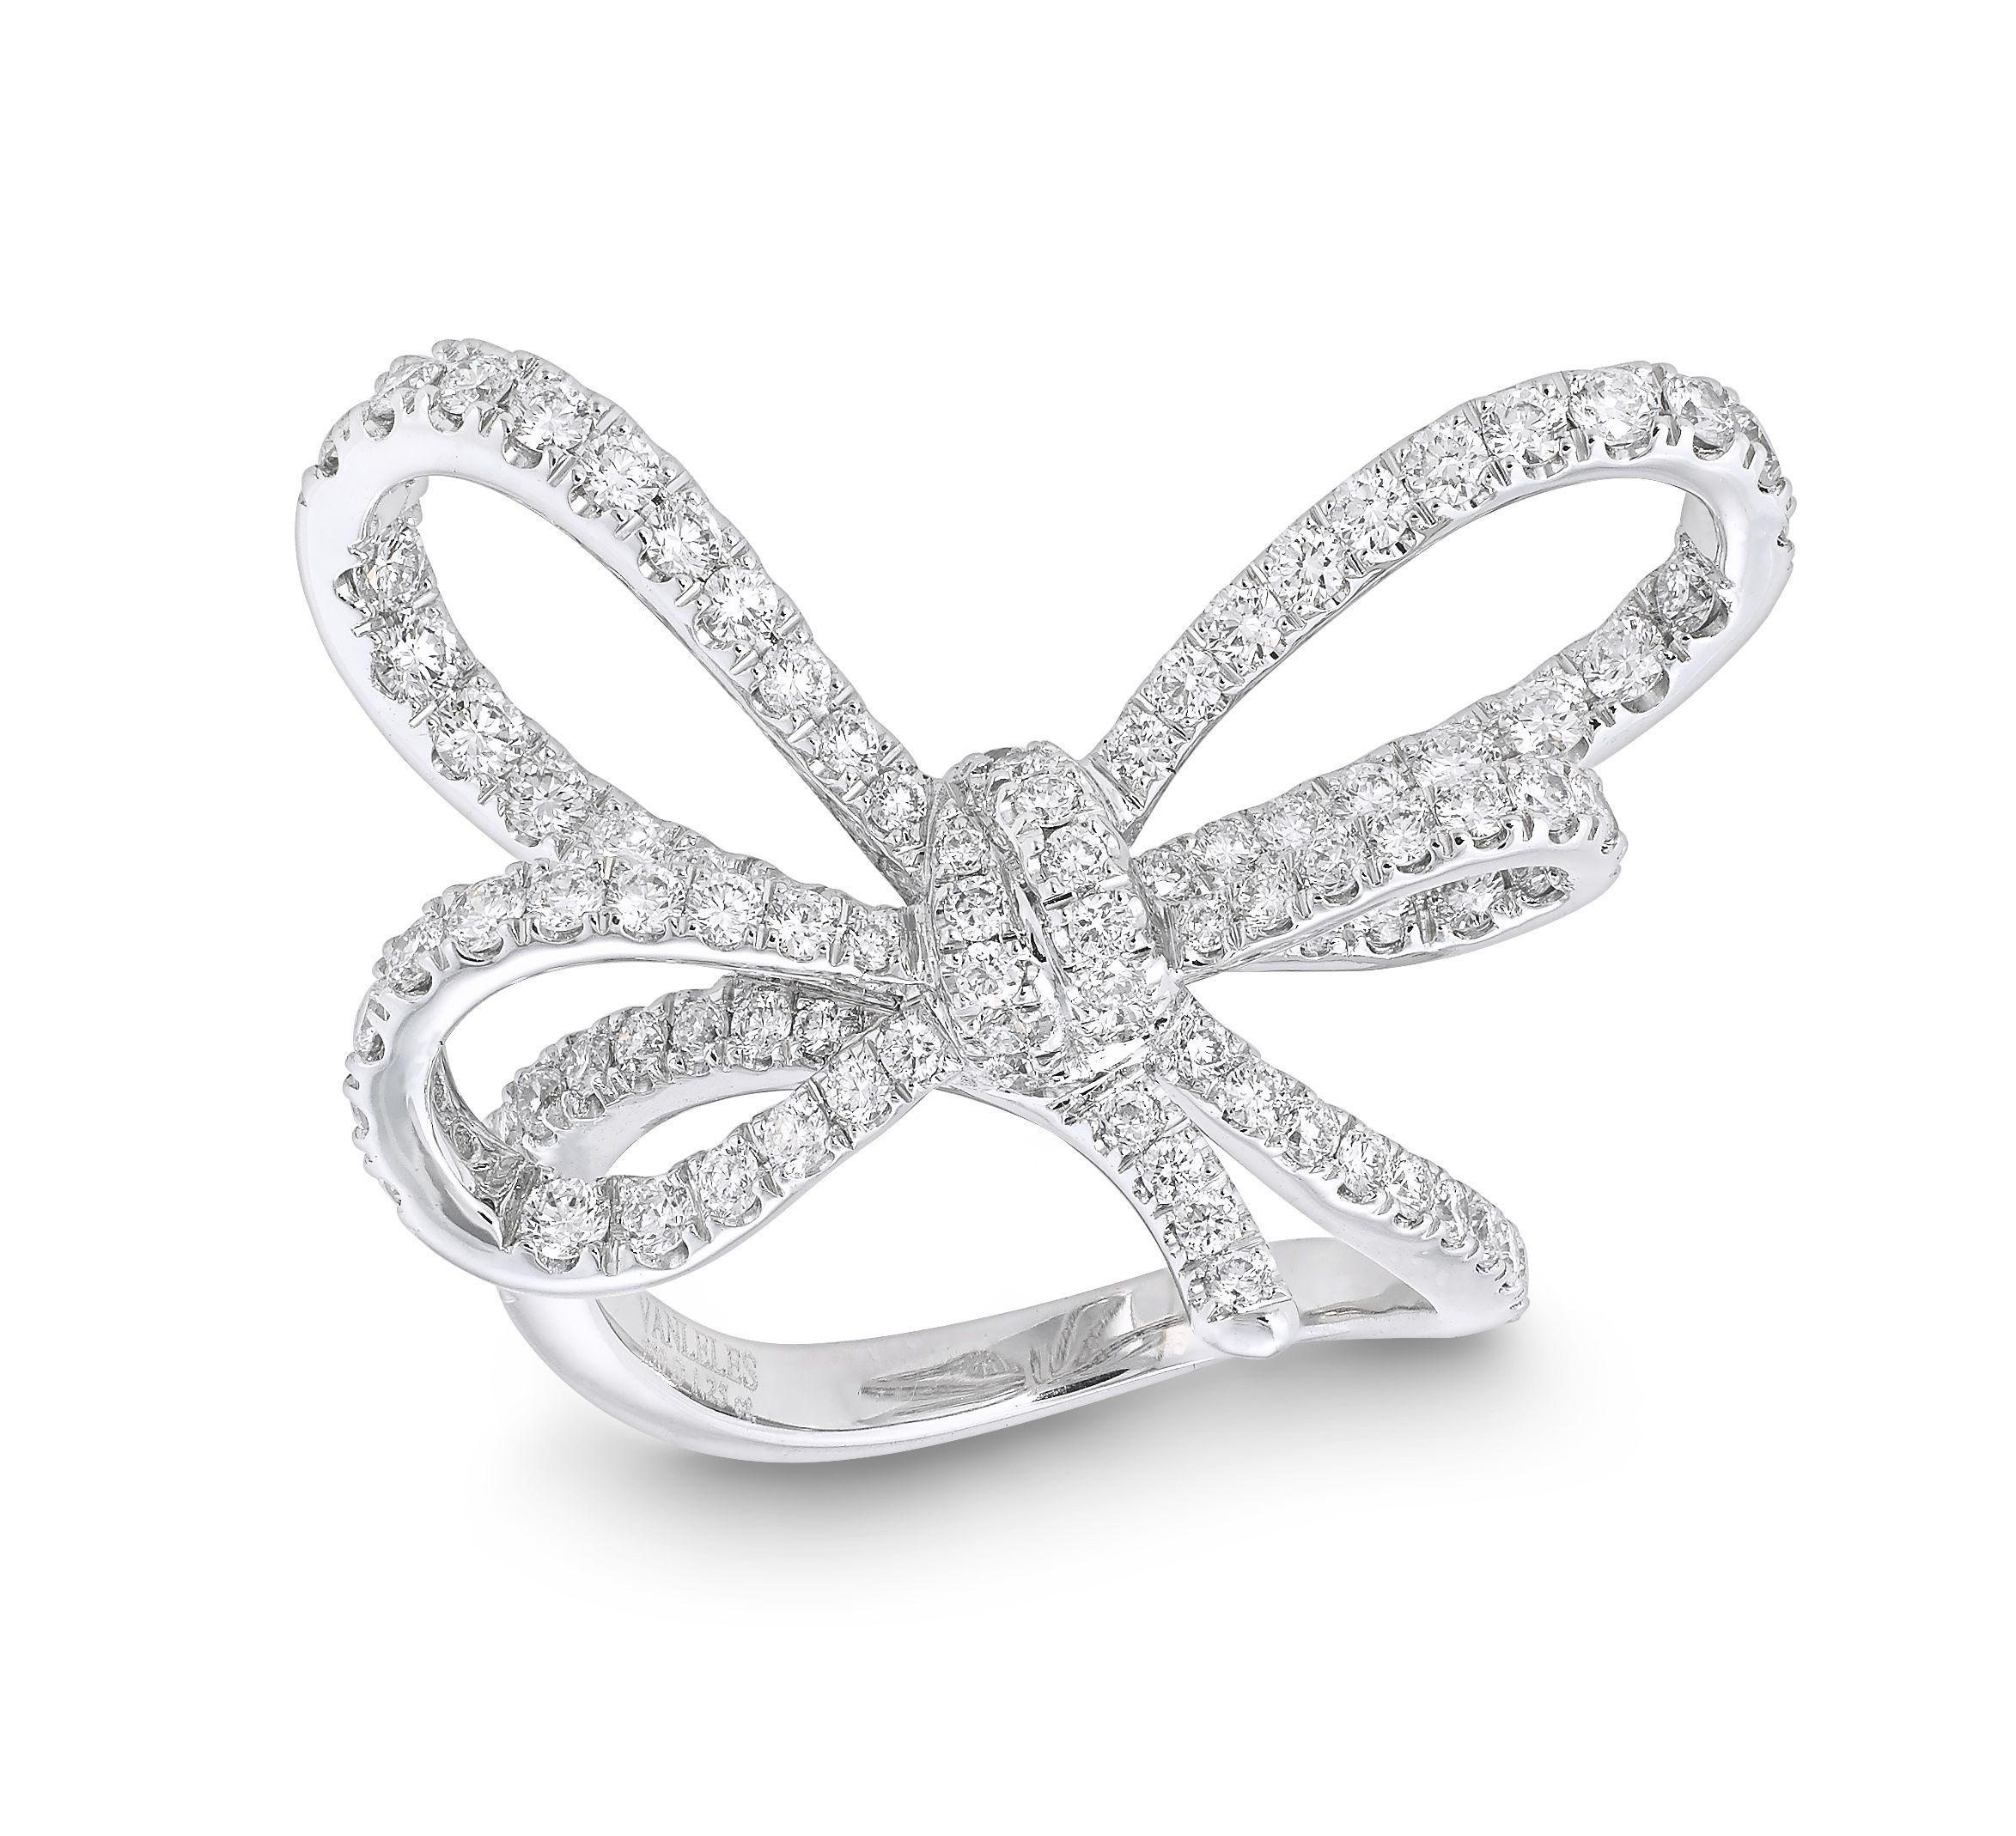 LYLA S BOW RING Set in 18K white gold Diamonds GVS x102 =1 25